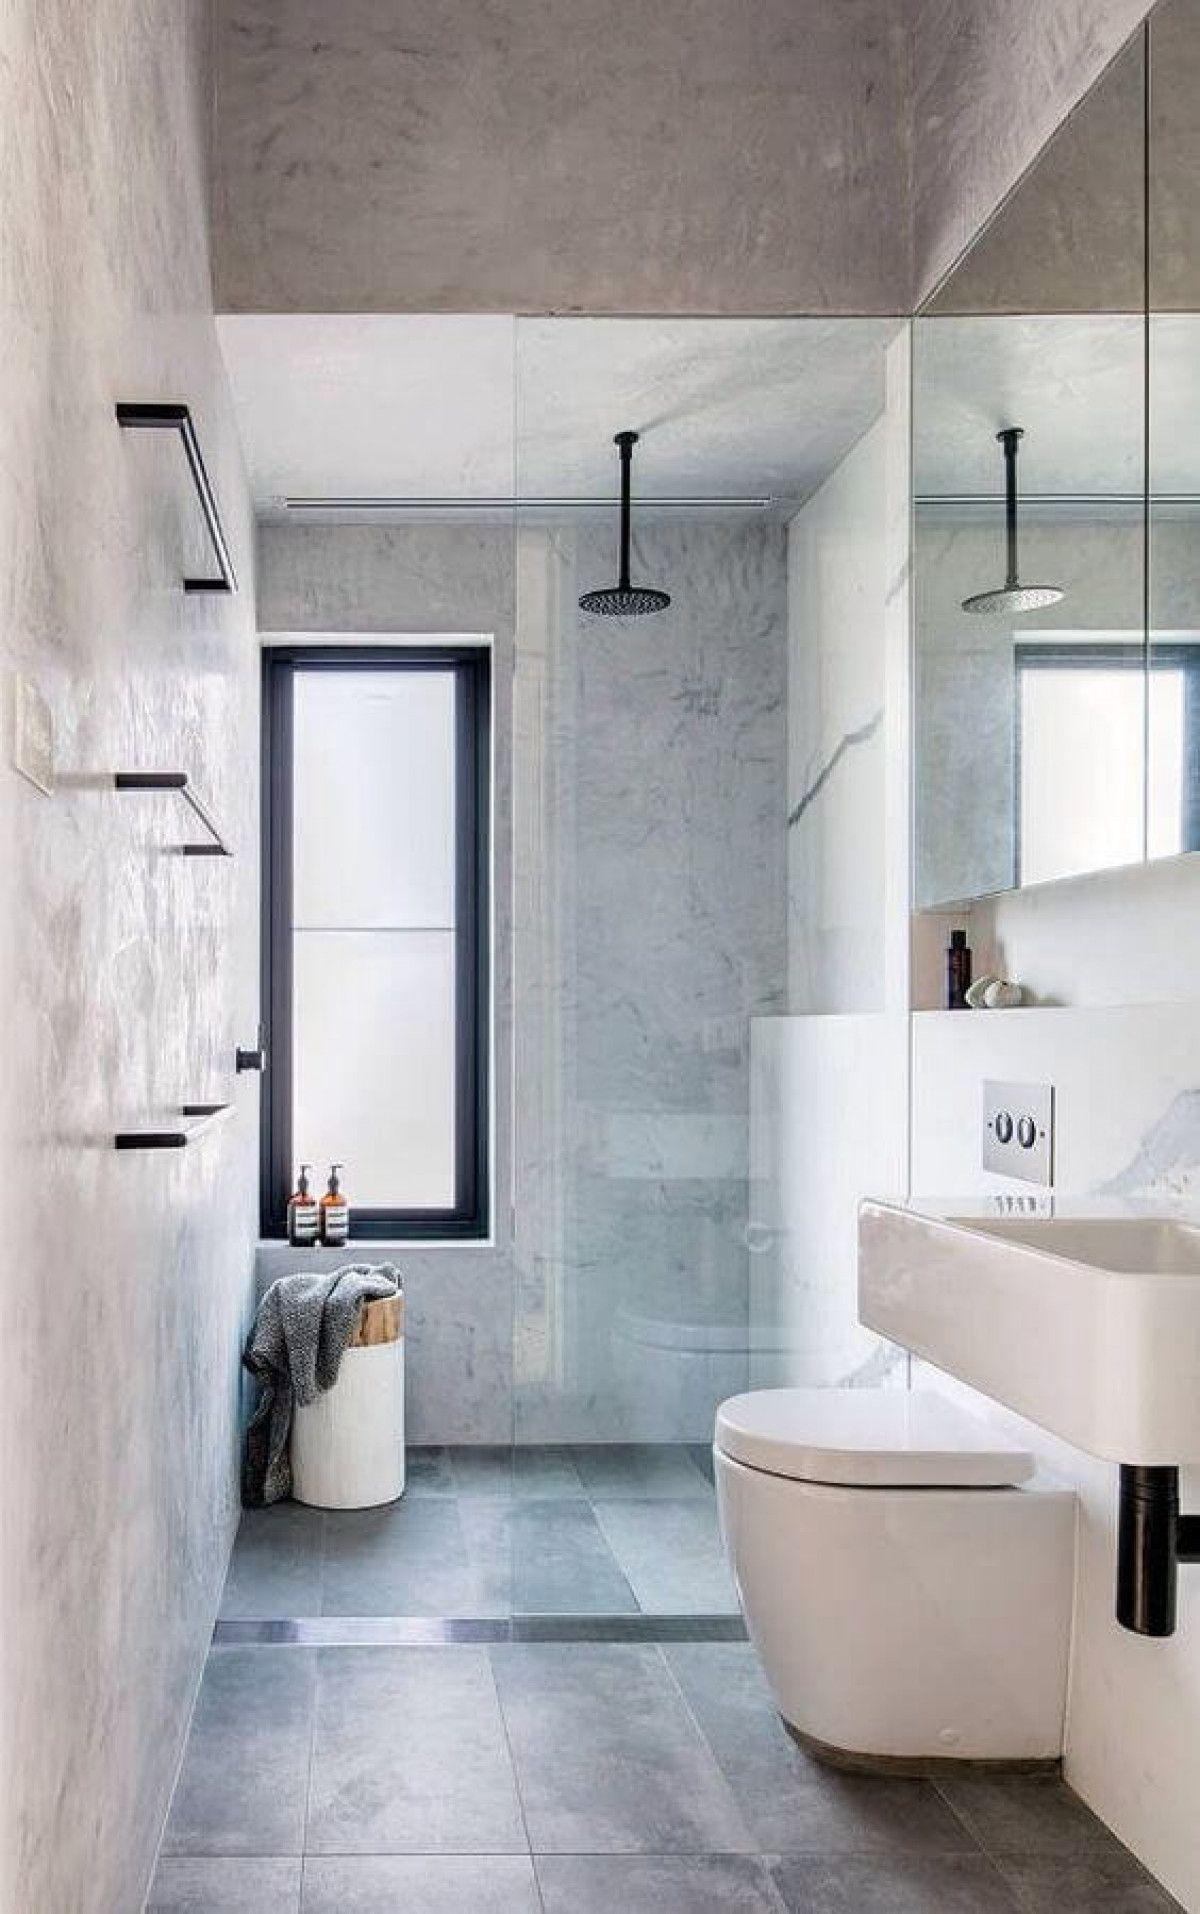 11 Brilliant Walk In Shower Ideas For Small Bathrooms Narrow Bathroom Designs Bathroom Layout Bathrooms Remodel